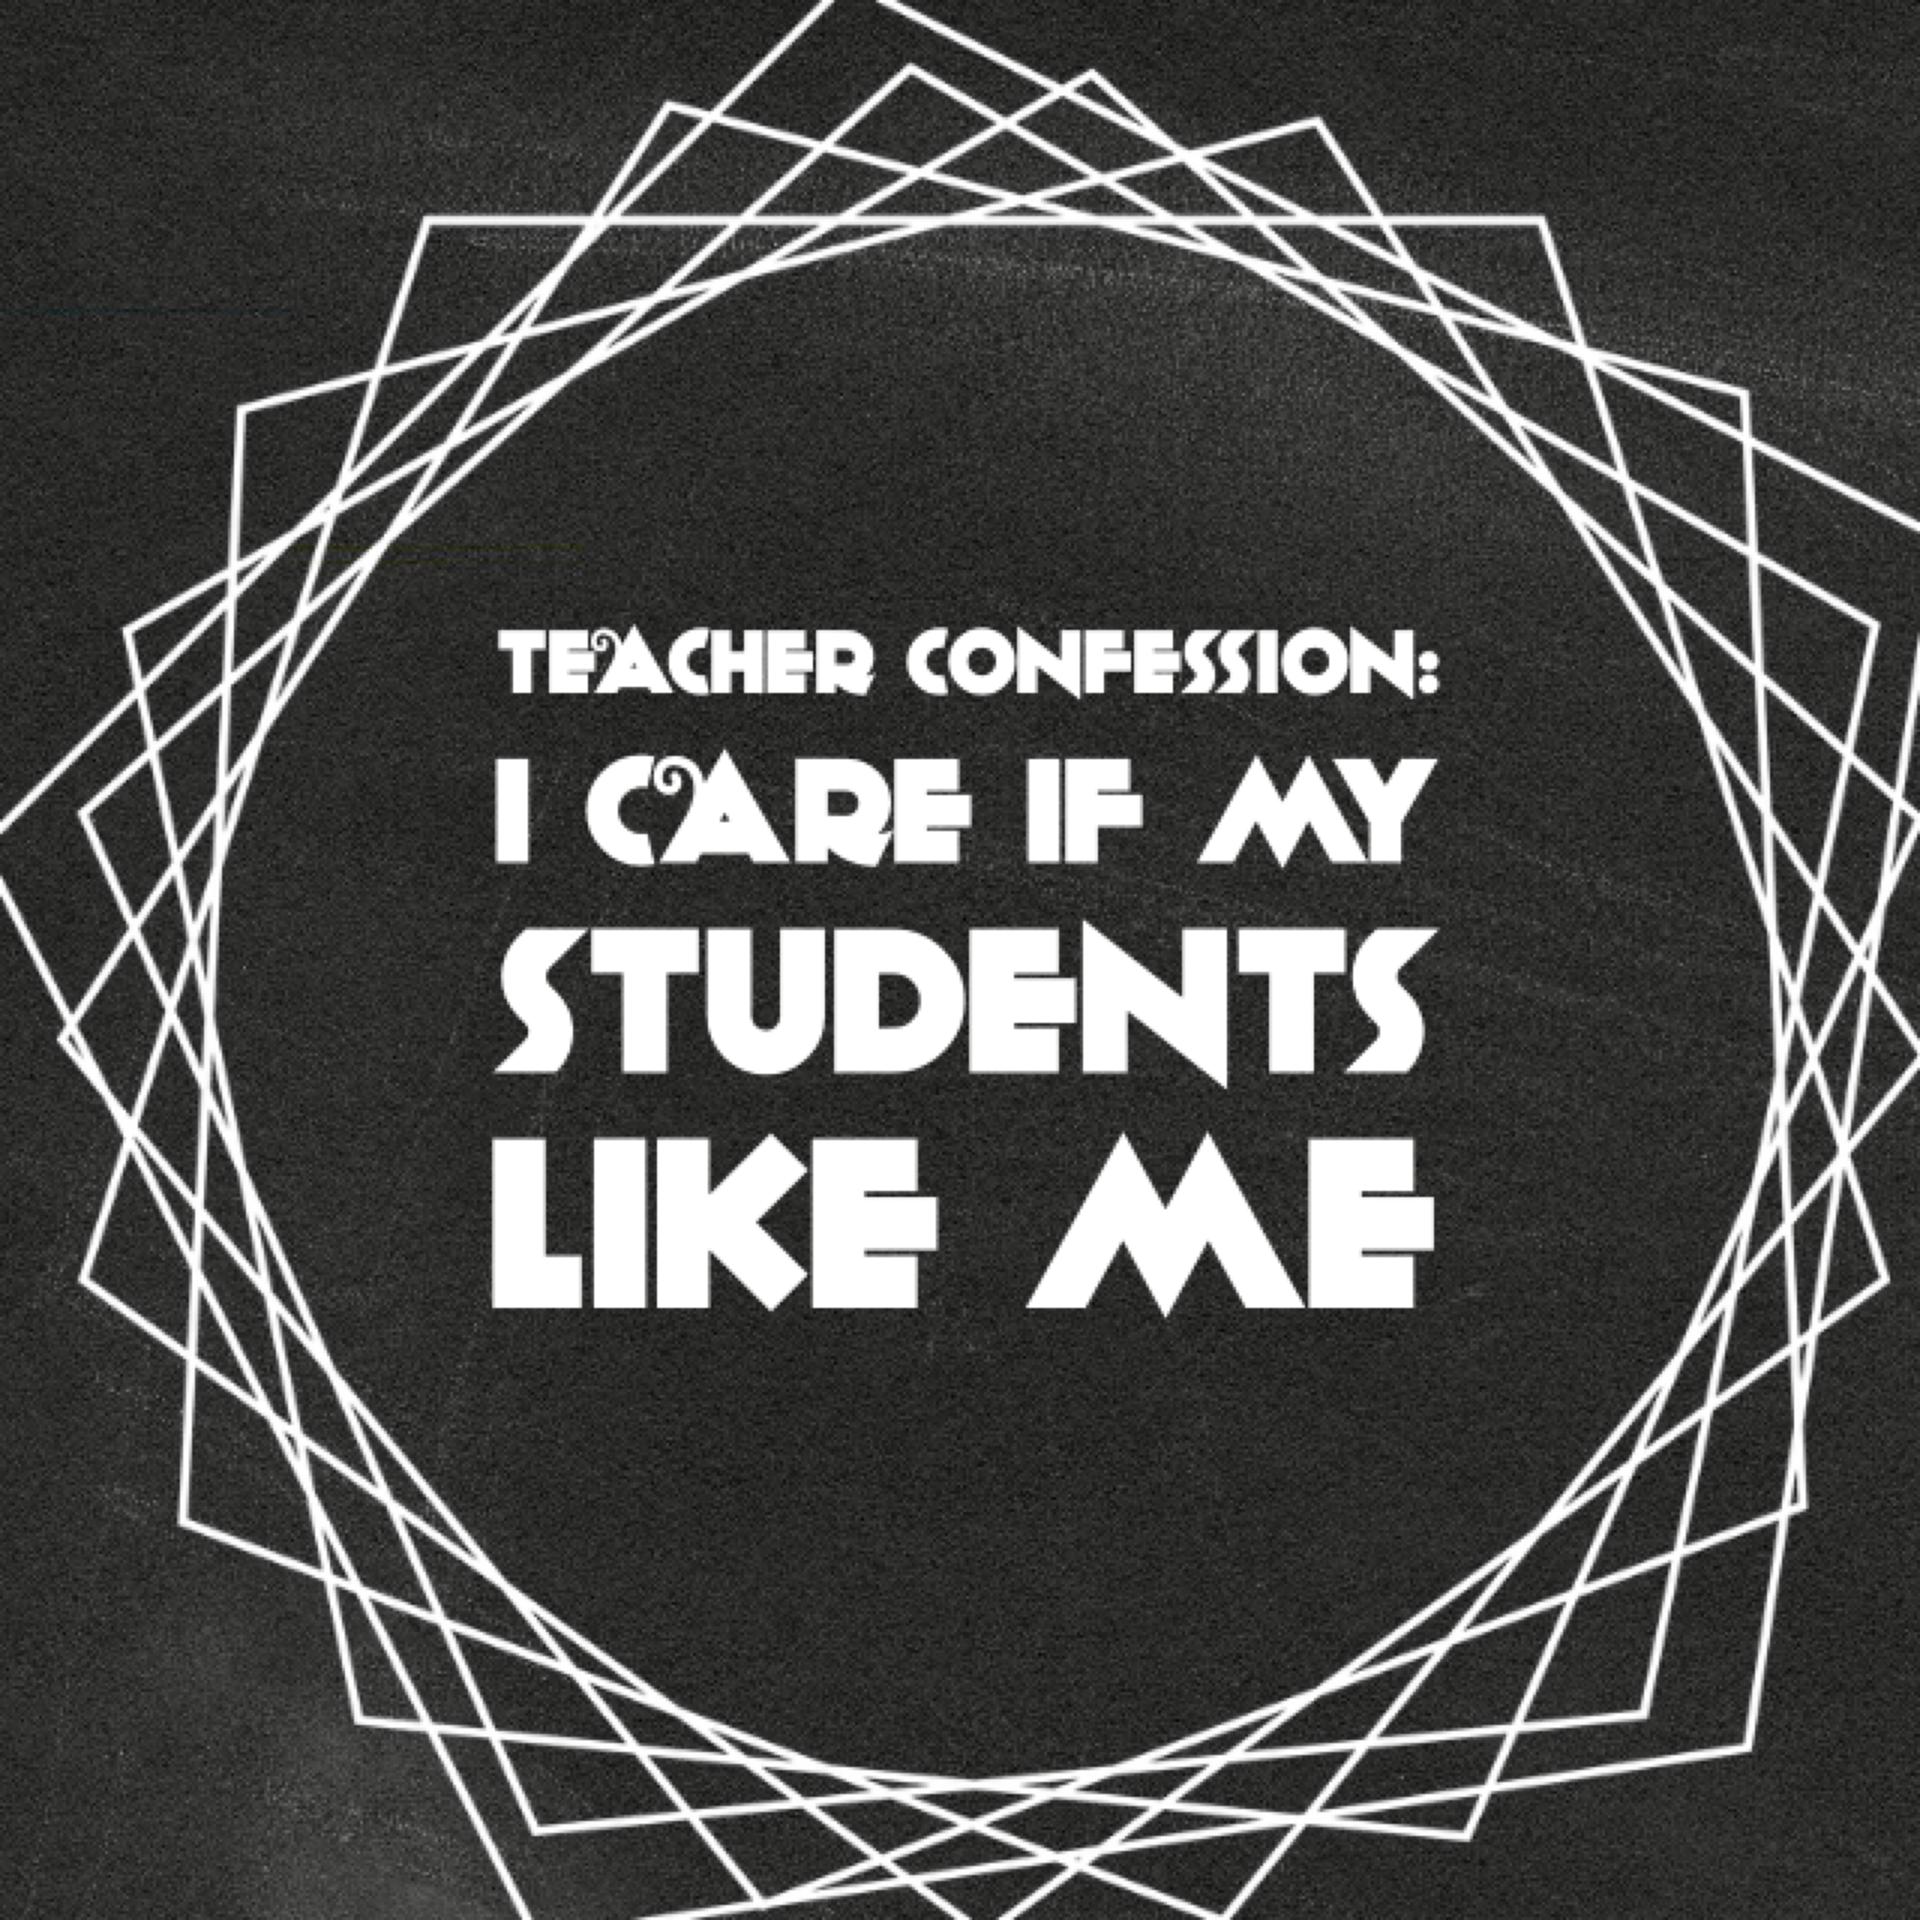 Students: Would you like me as a teacher?